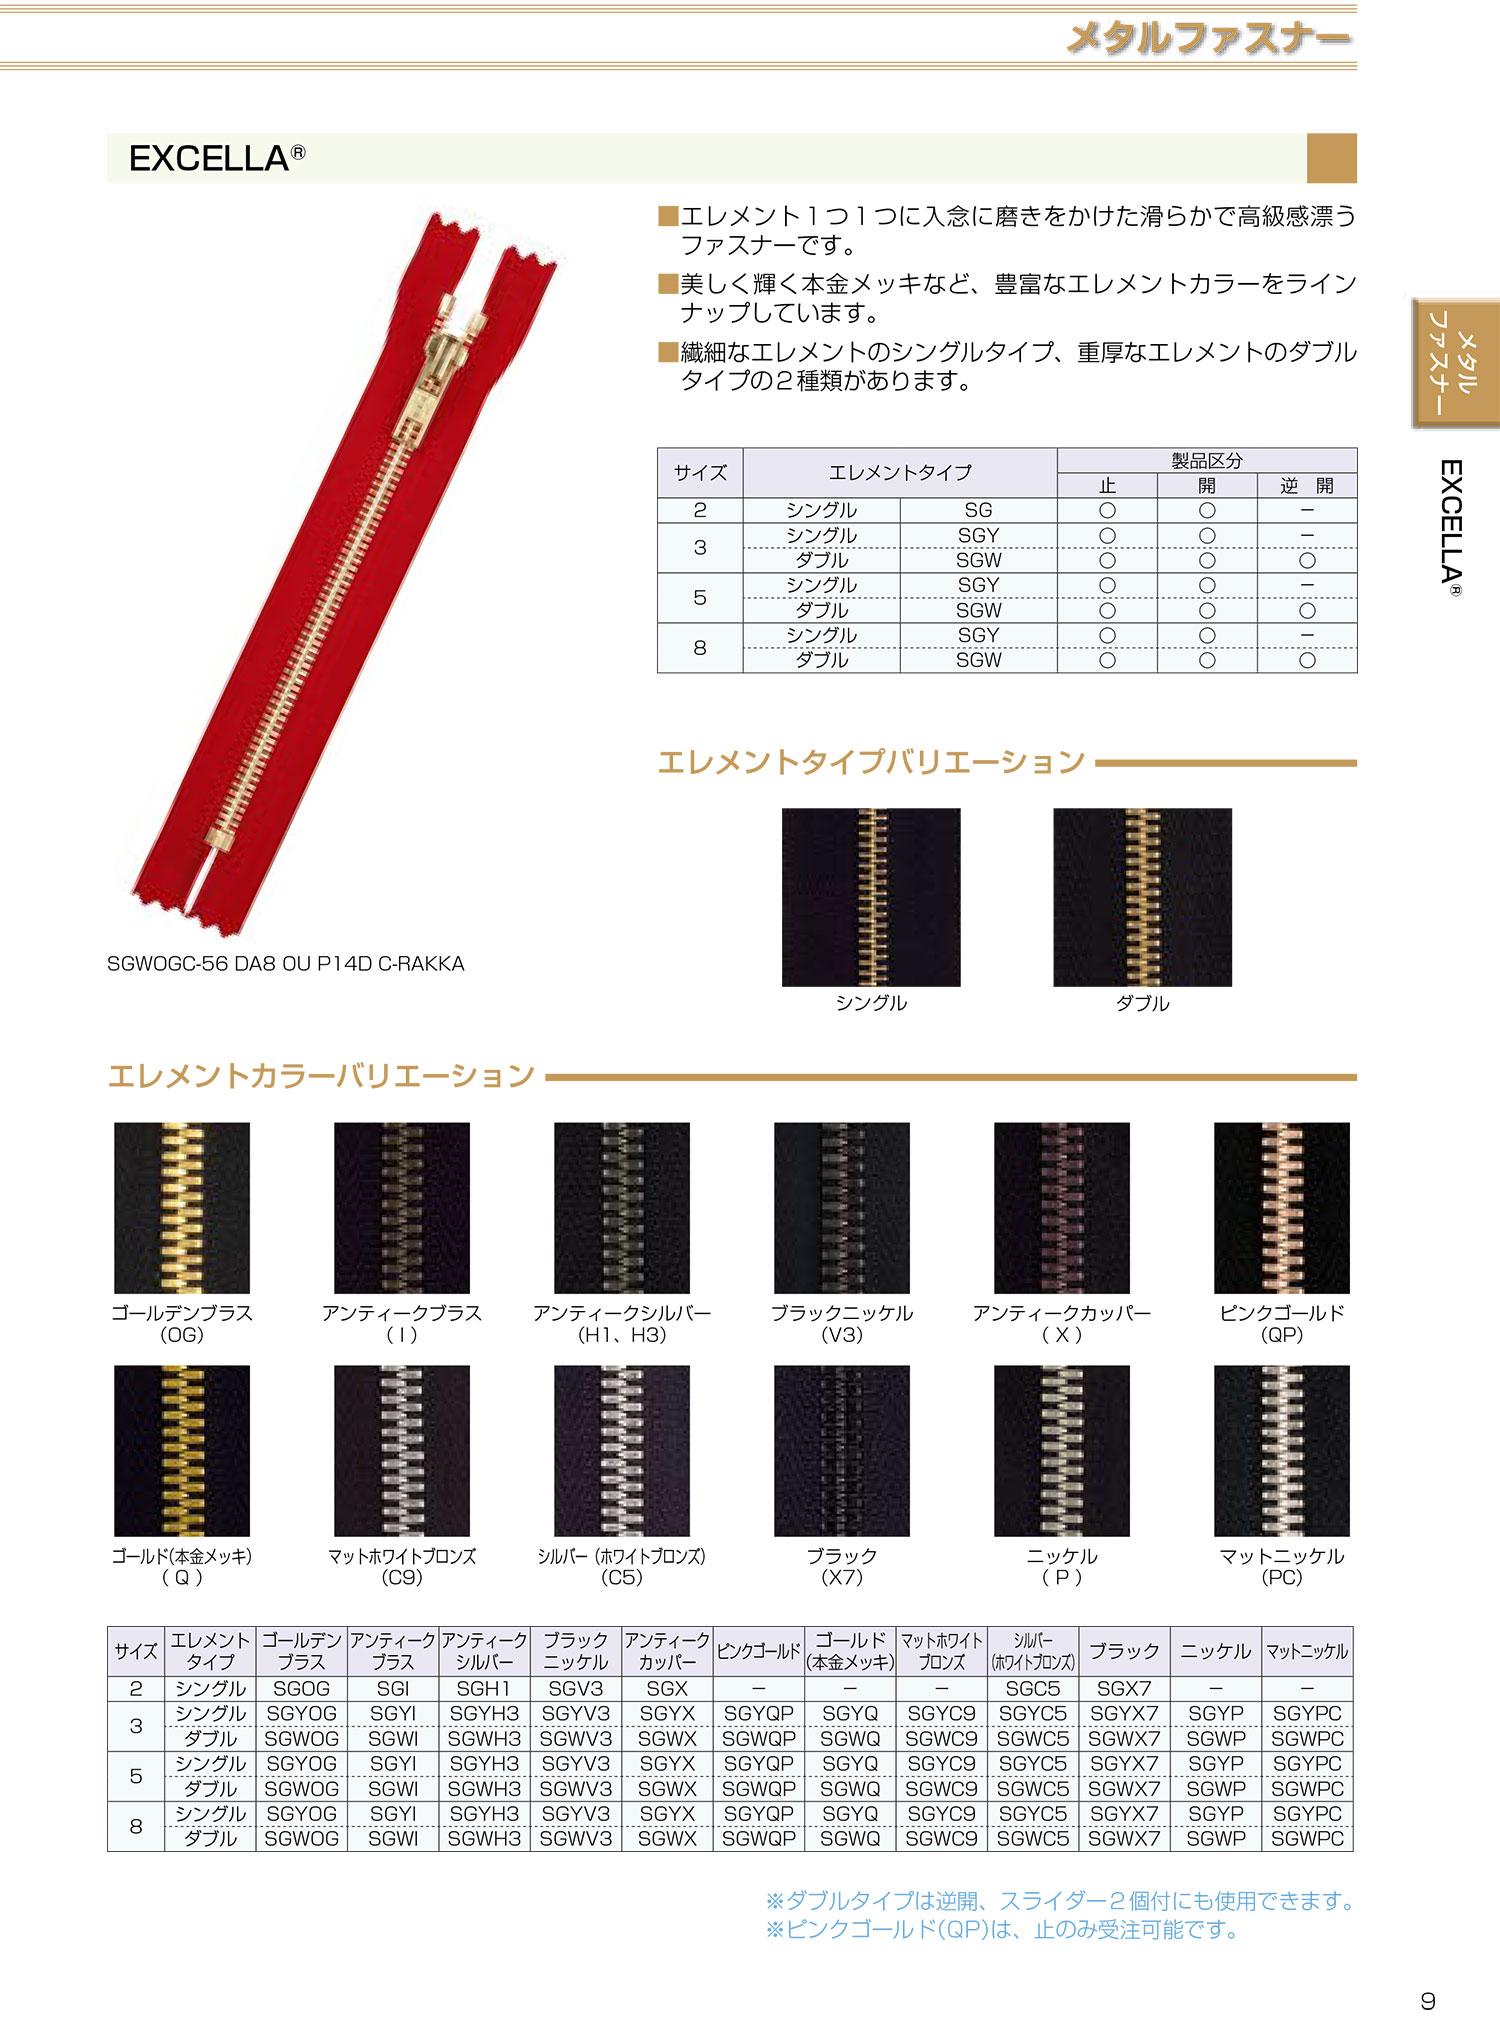 5SGYQOR エクセラ 5サイズ ゴールド(本金メッキ) オープン シングル[ファスナー] YKK/オークラ商事 - ApparelX アパレル資材卸通販